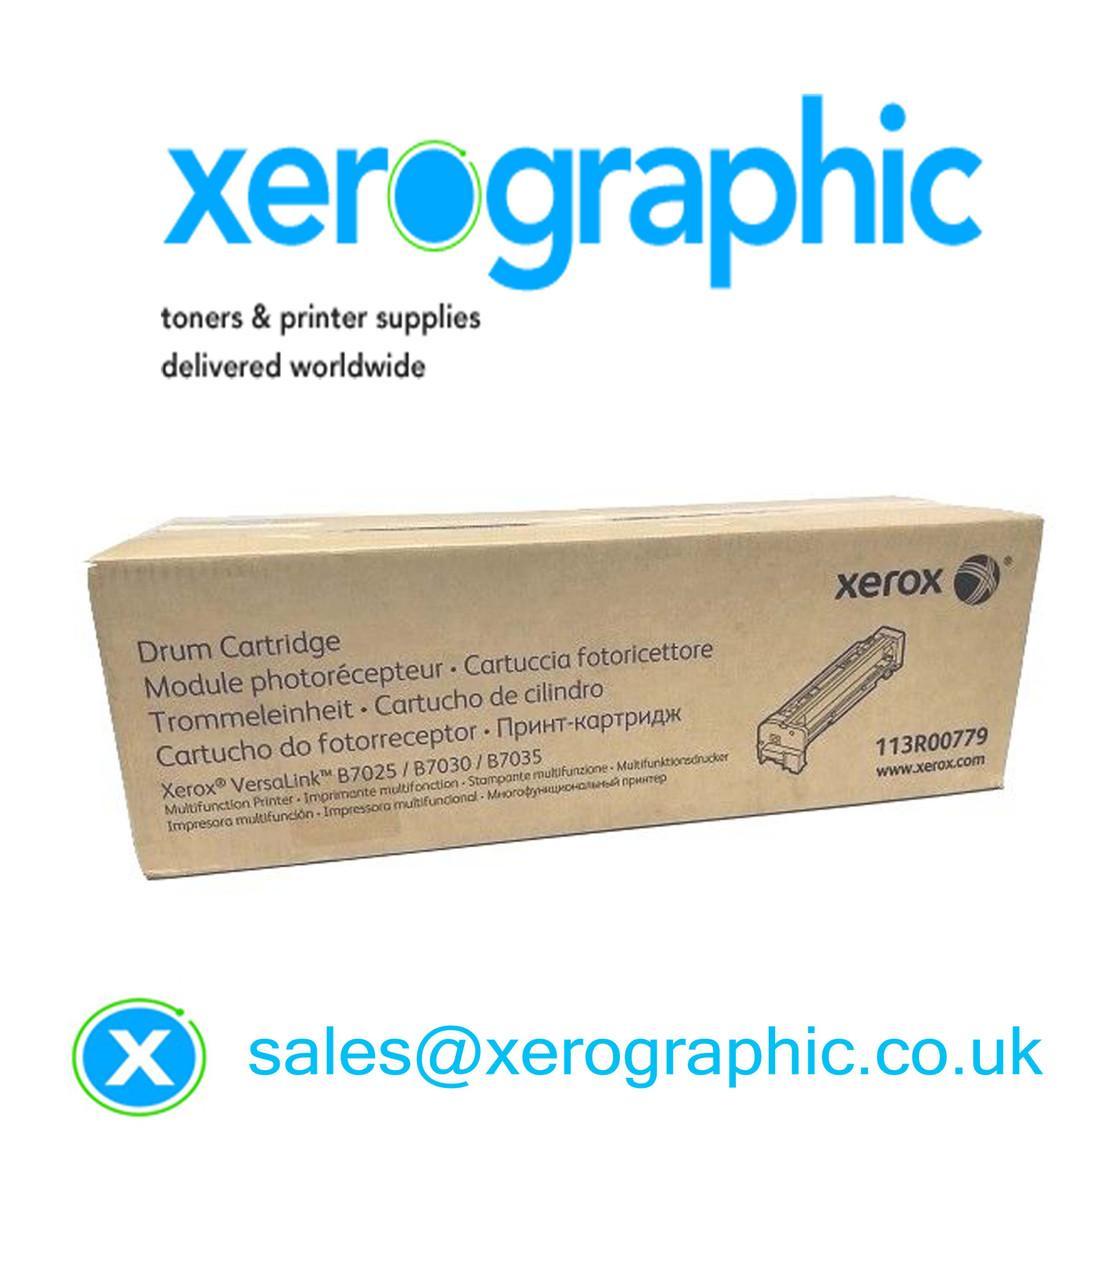 Xerox VersaLink B7025, B7030, B7035, Genuine Black Drum Cartridge  113R00779, 113R779